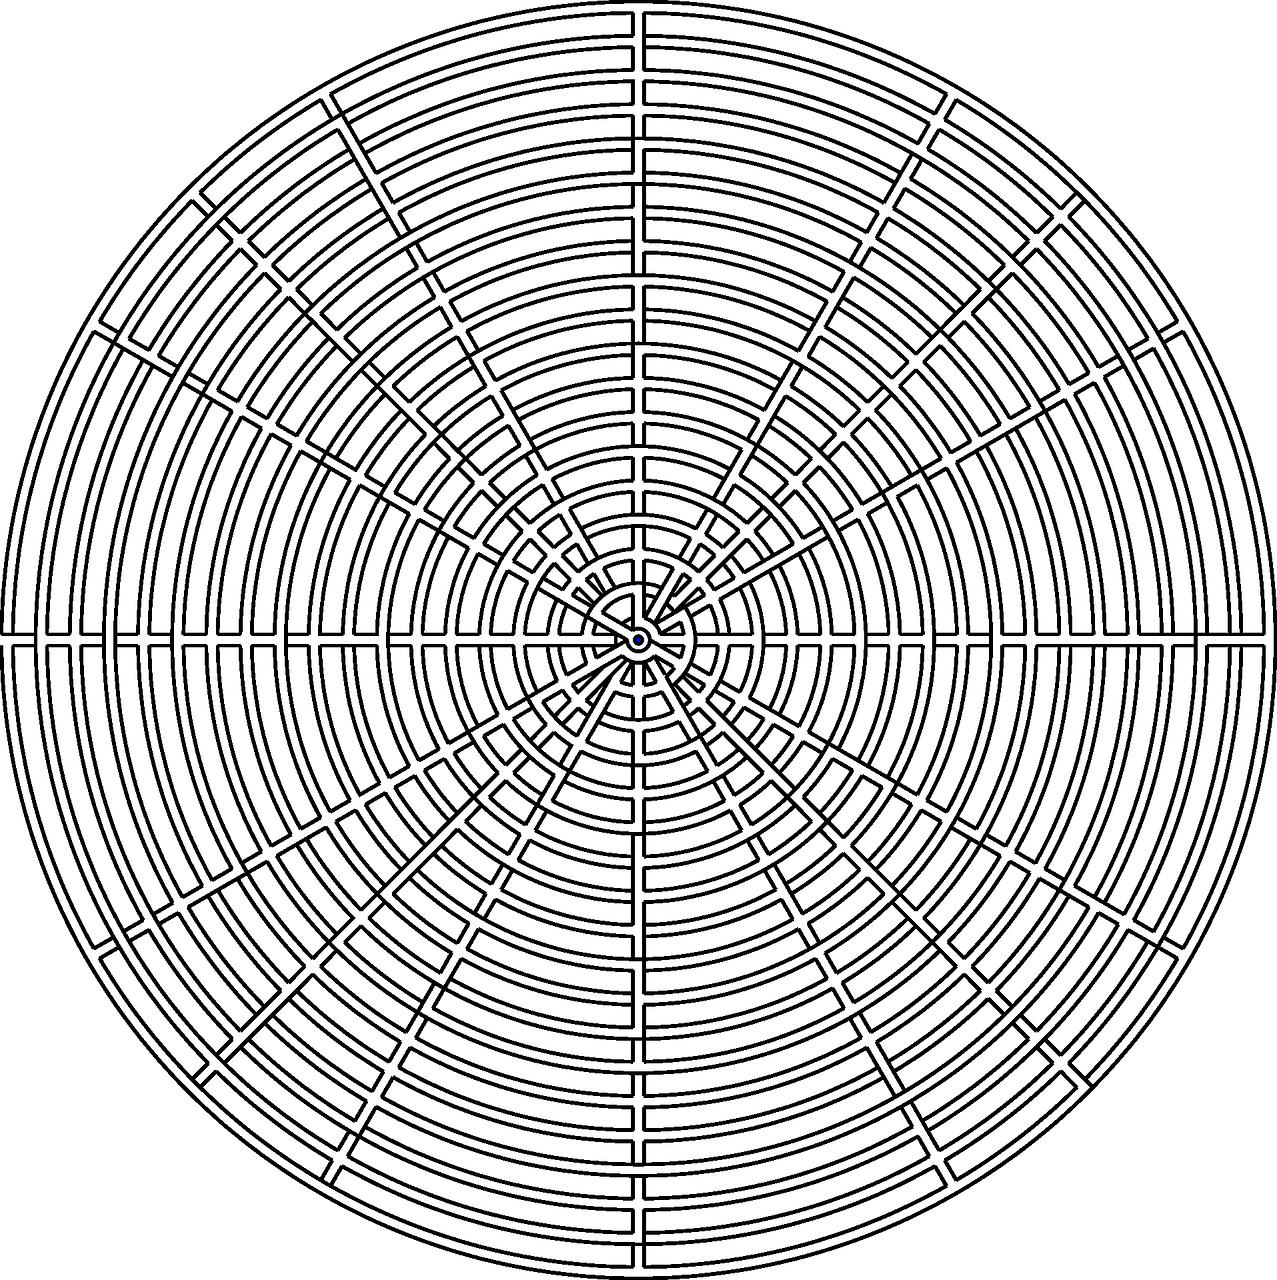 ventilation-grid-161806_1280